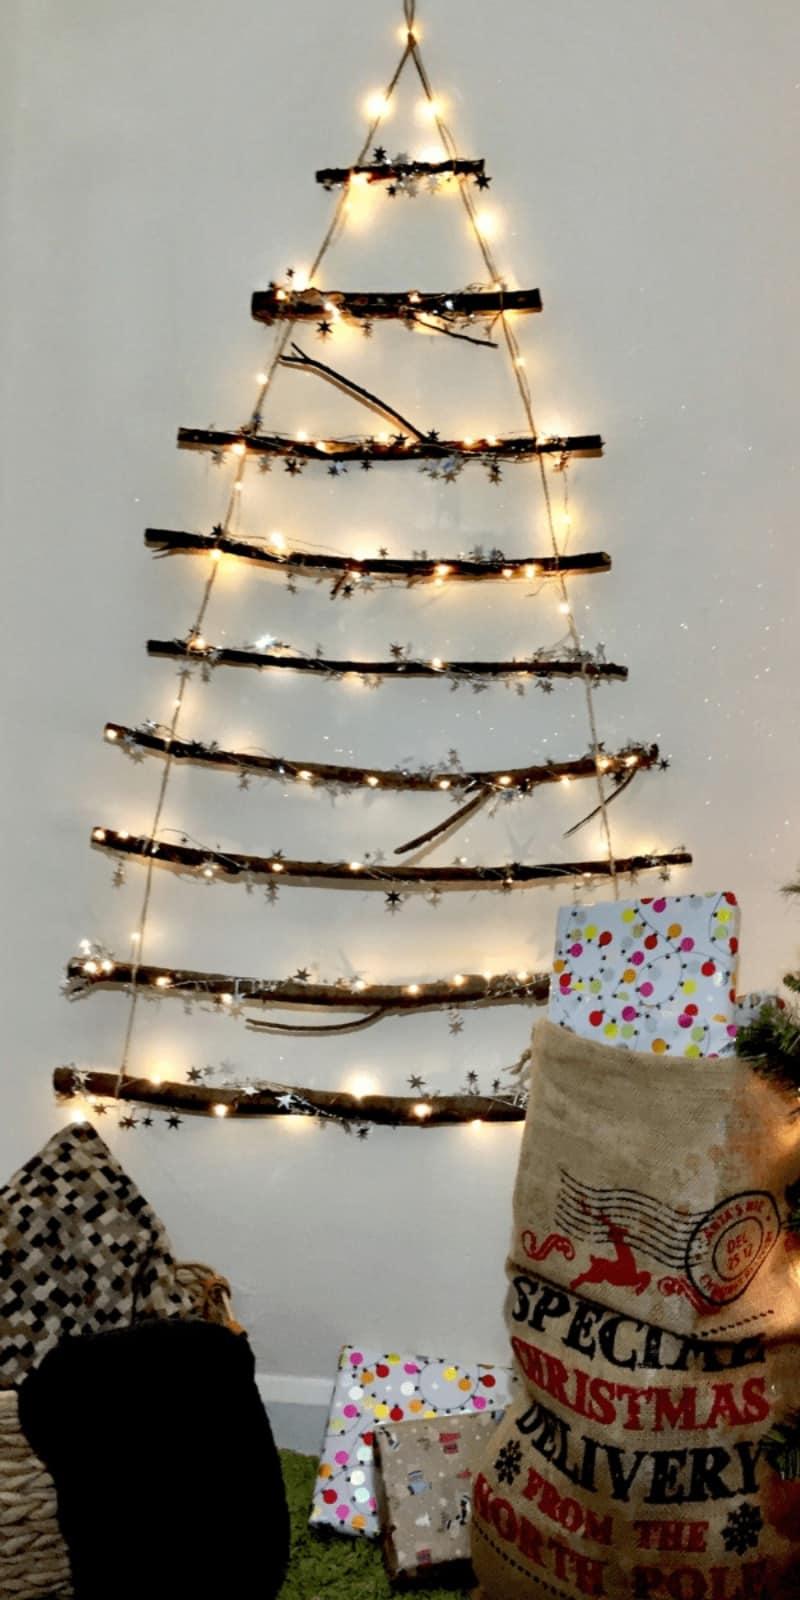 A twig wall Christmas tree with lights